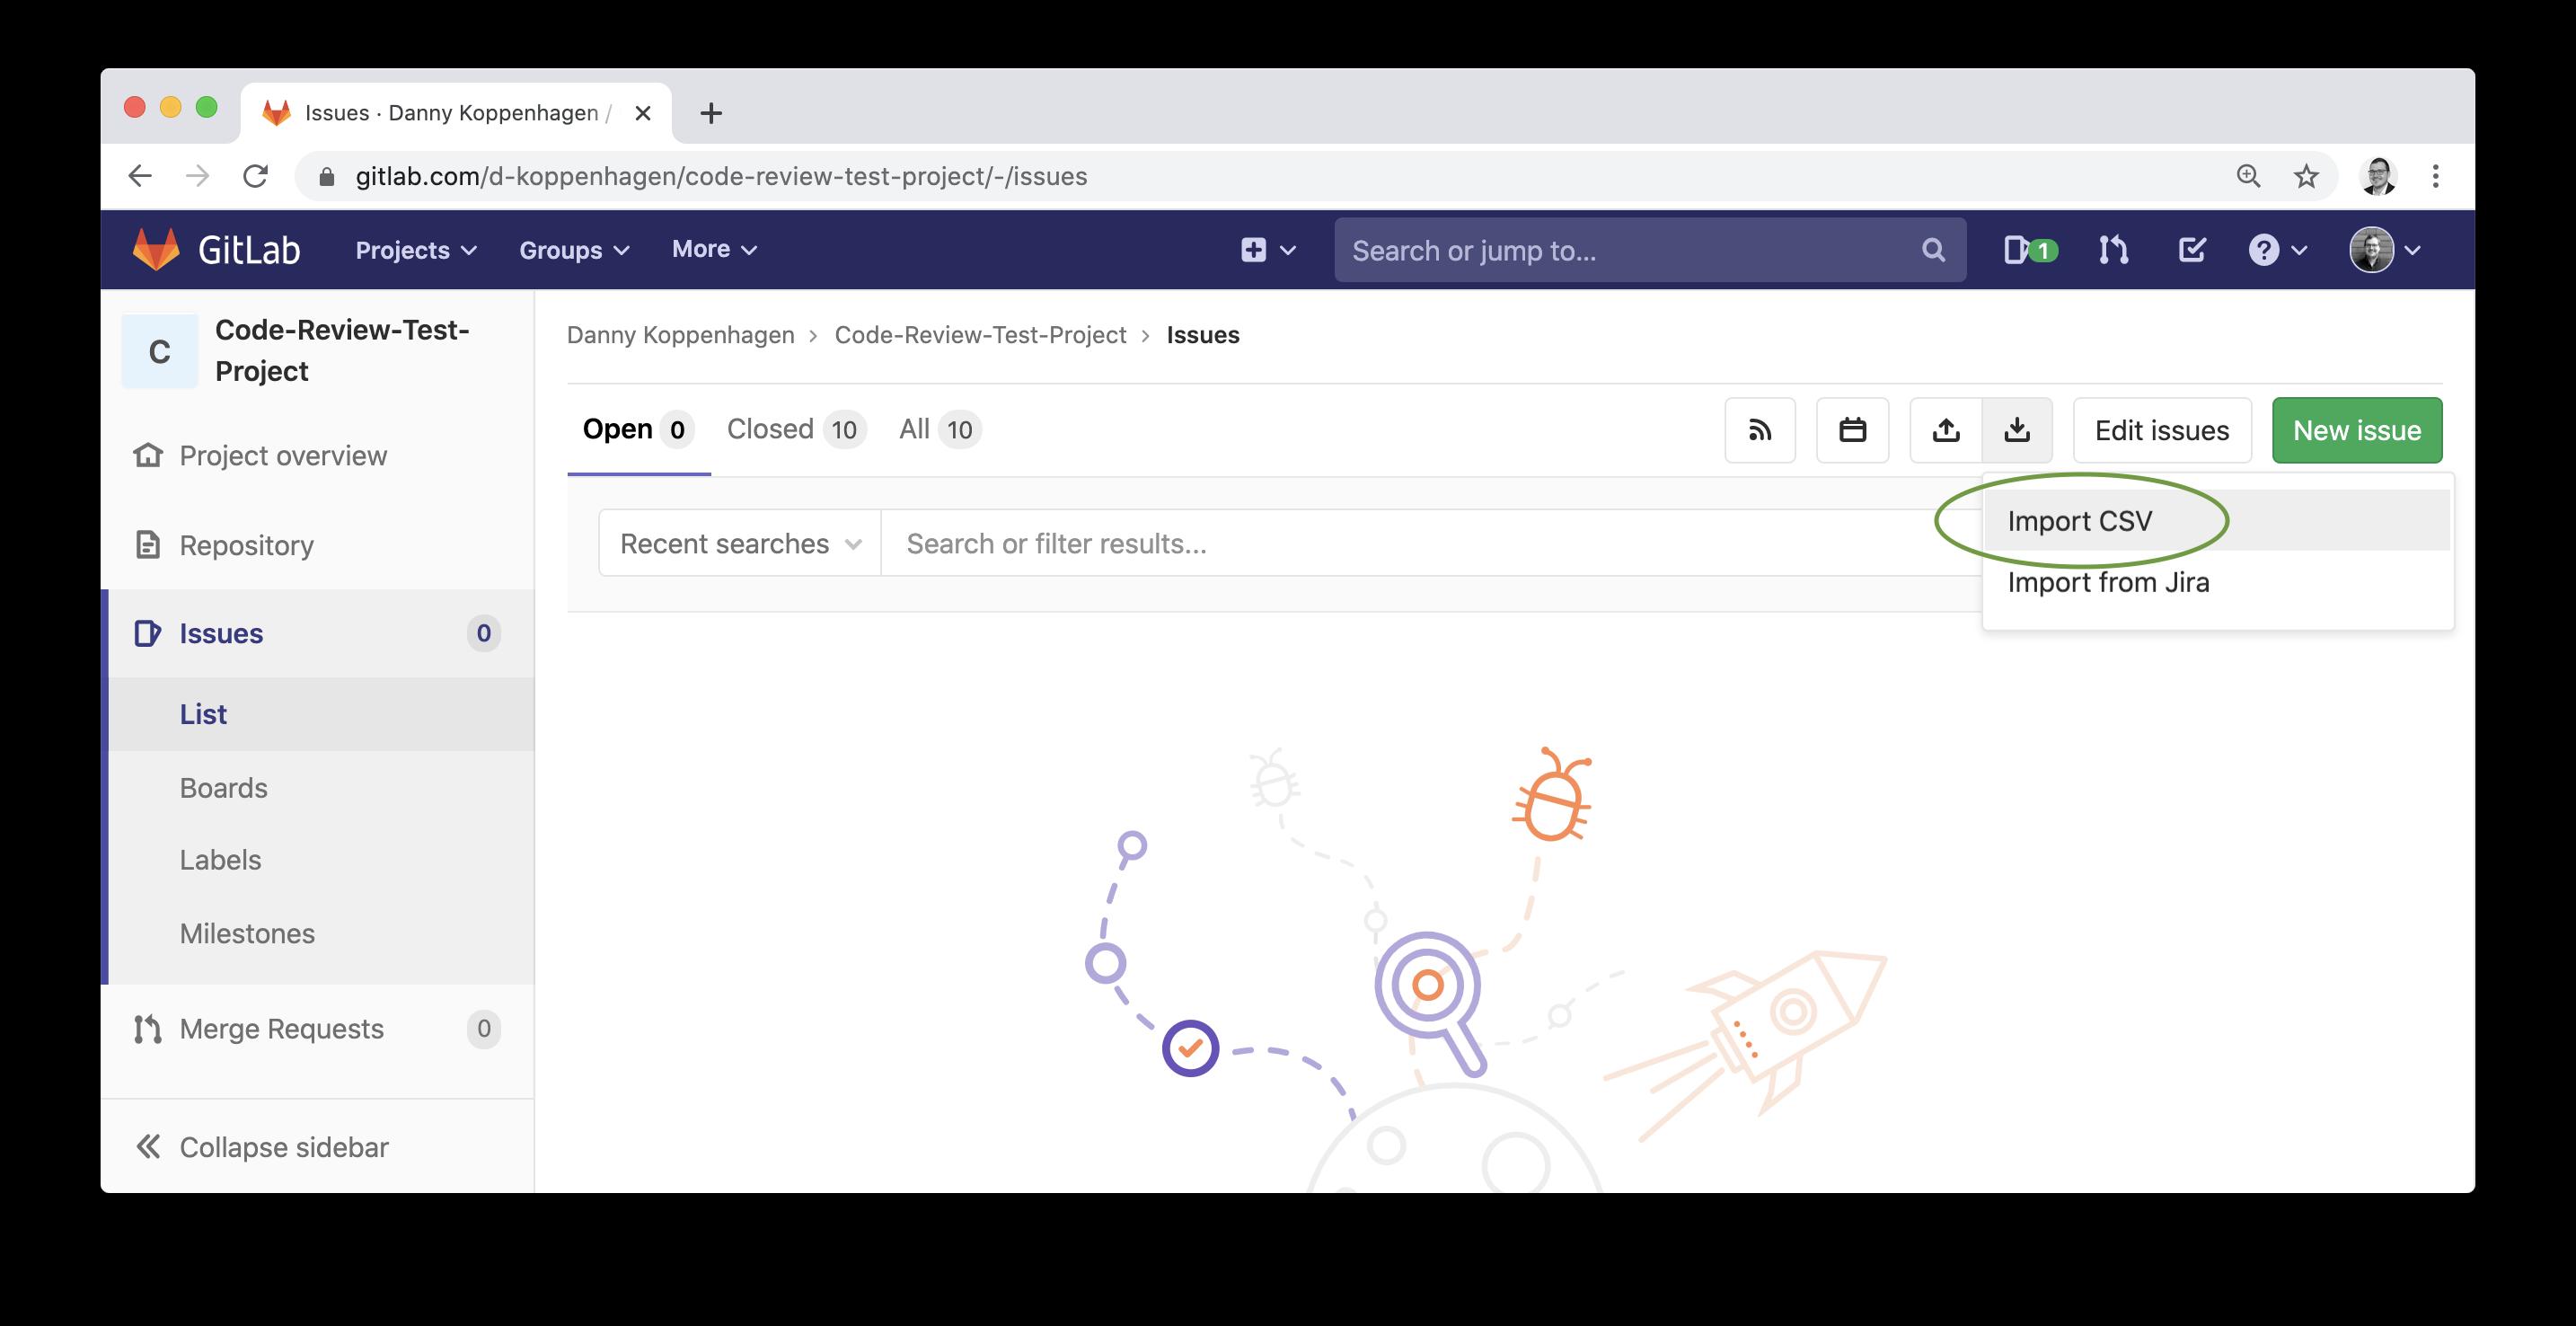 GitLab import CSV file